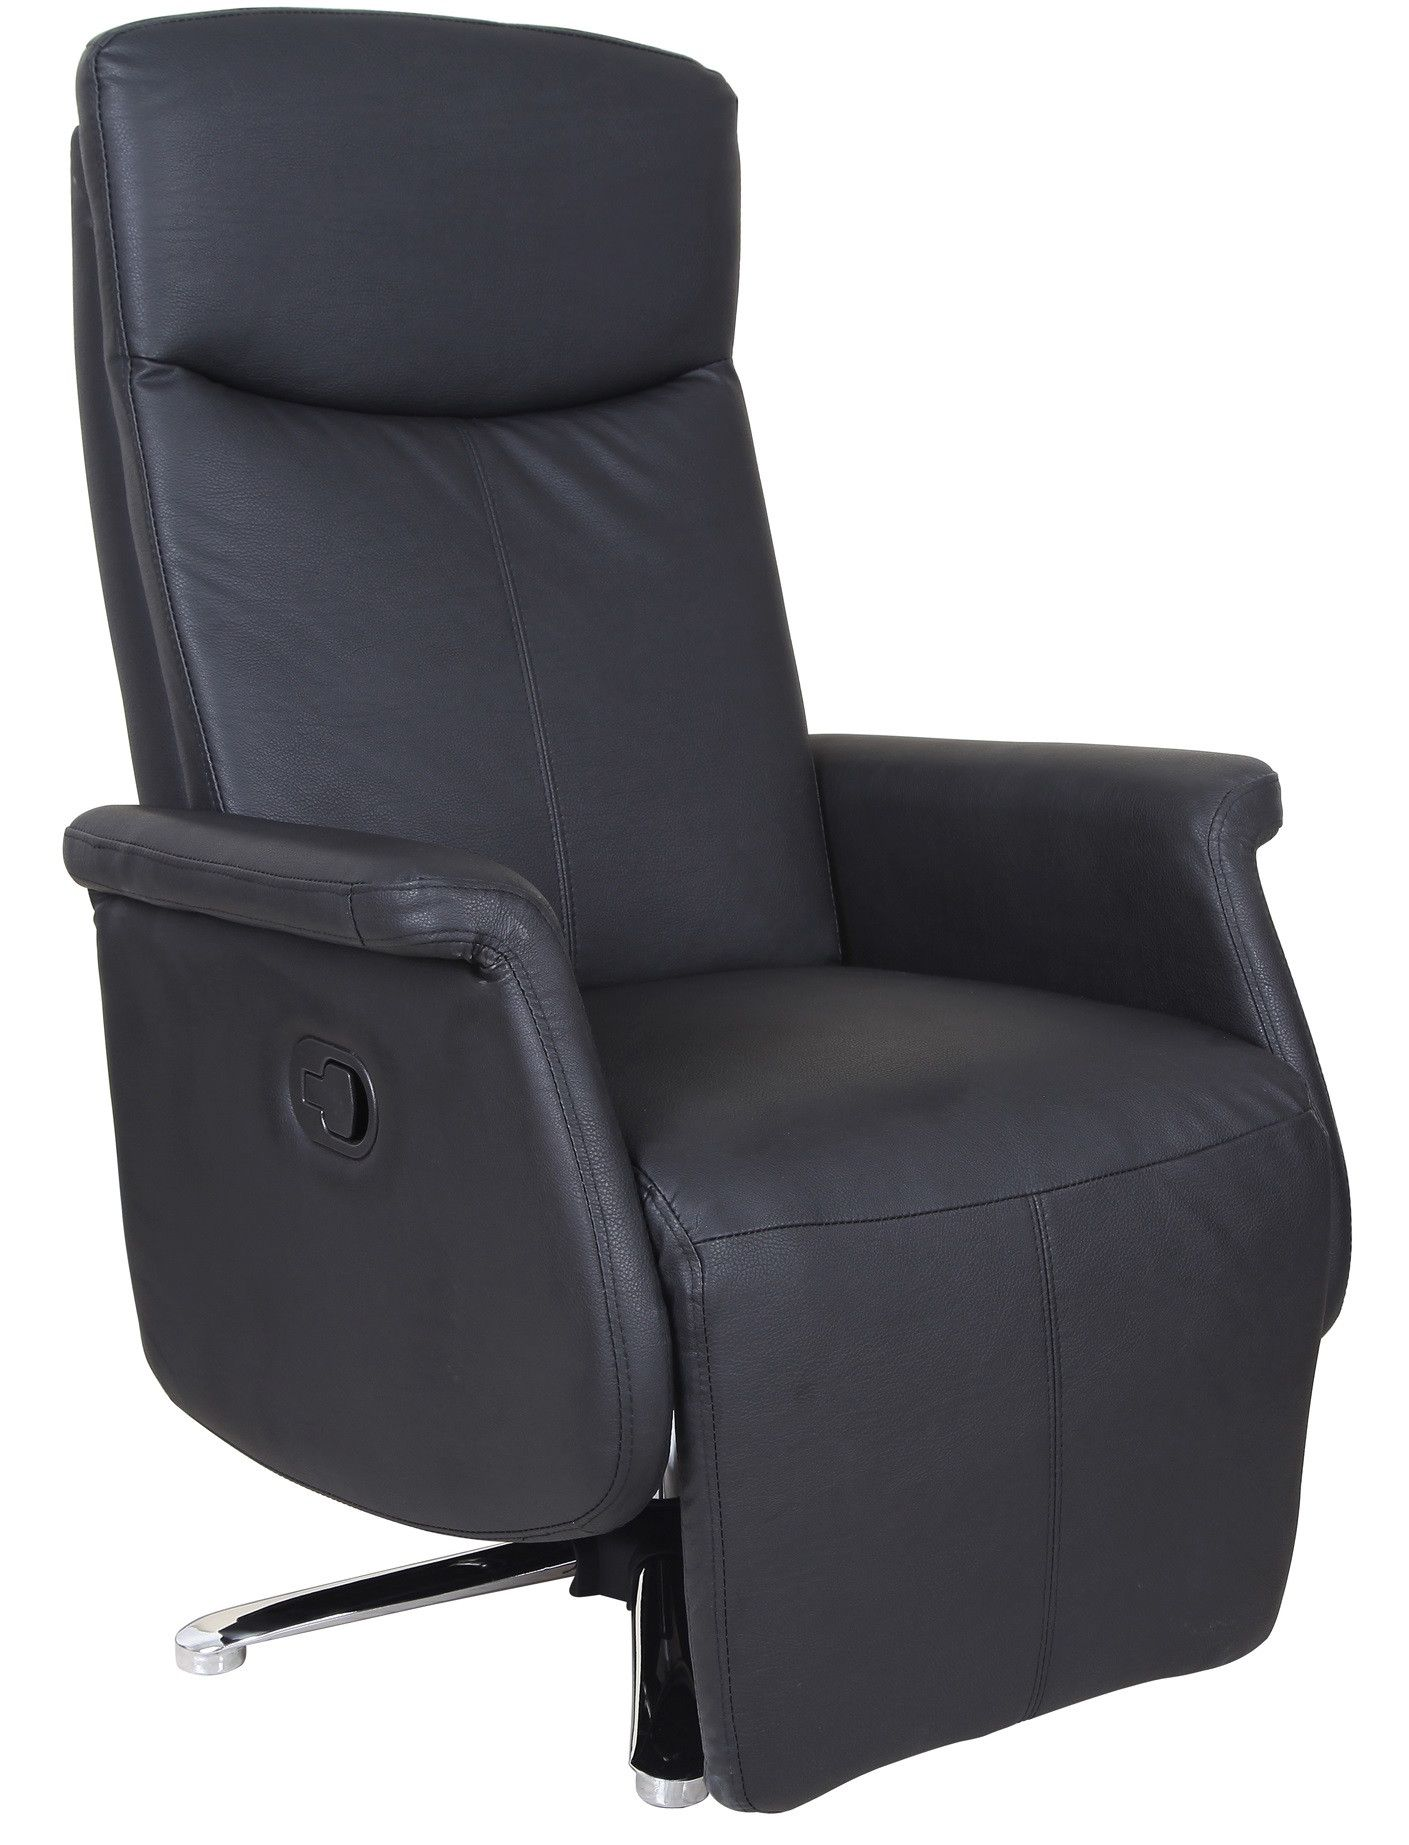 fauteuil relax pivotant cool tonnant fauteuil relax pivotant avec fauteuil pivotant fly beau. Black Bedroom Furniture Sets. Home Design Ideas